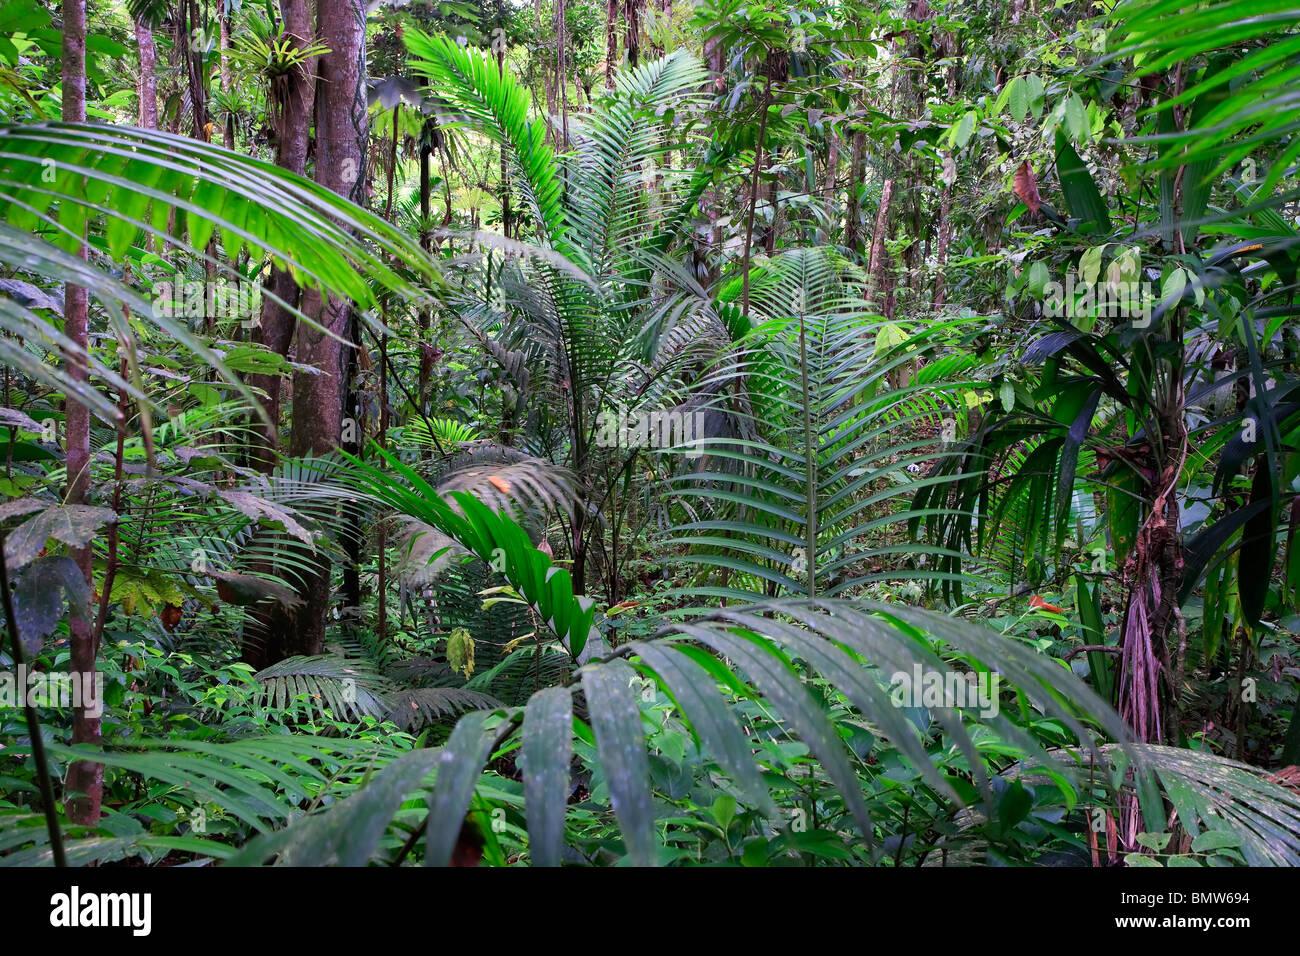 Karibik, St. Lucia, Des Cartier Trail, tropischer Regenwald Stockbild